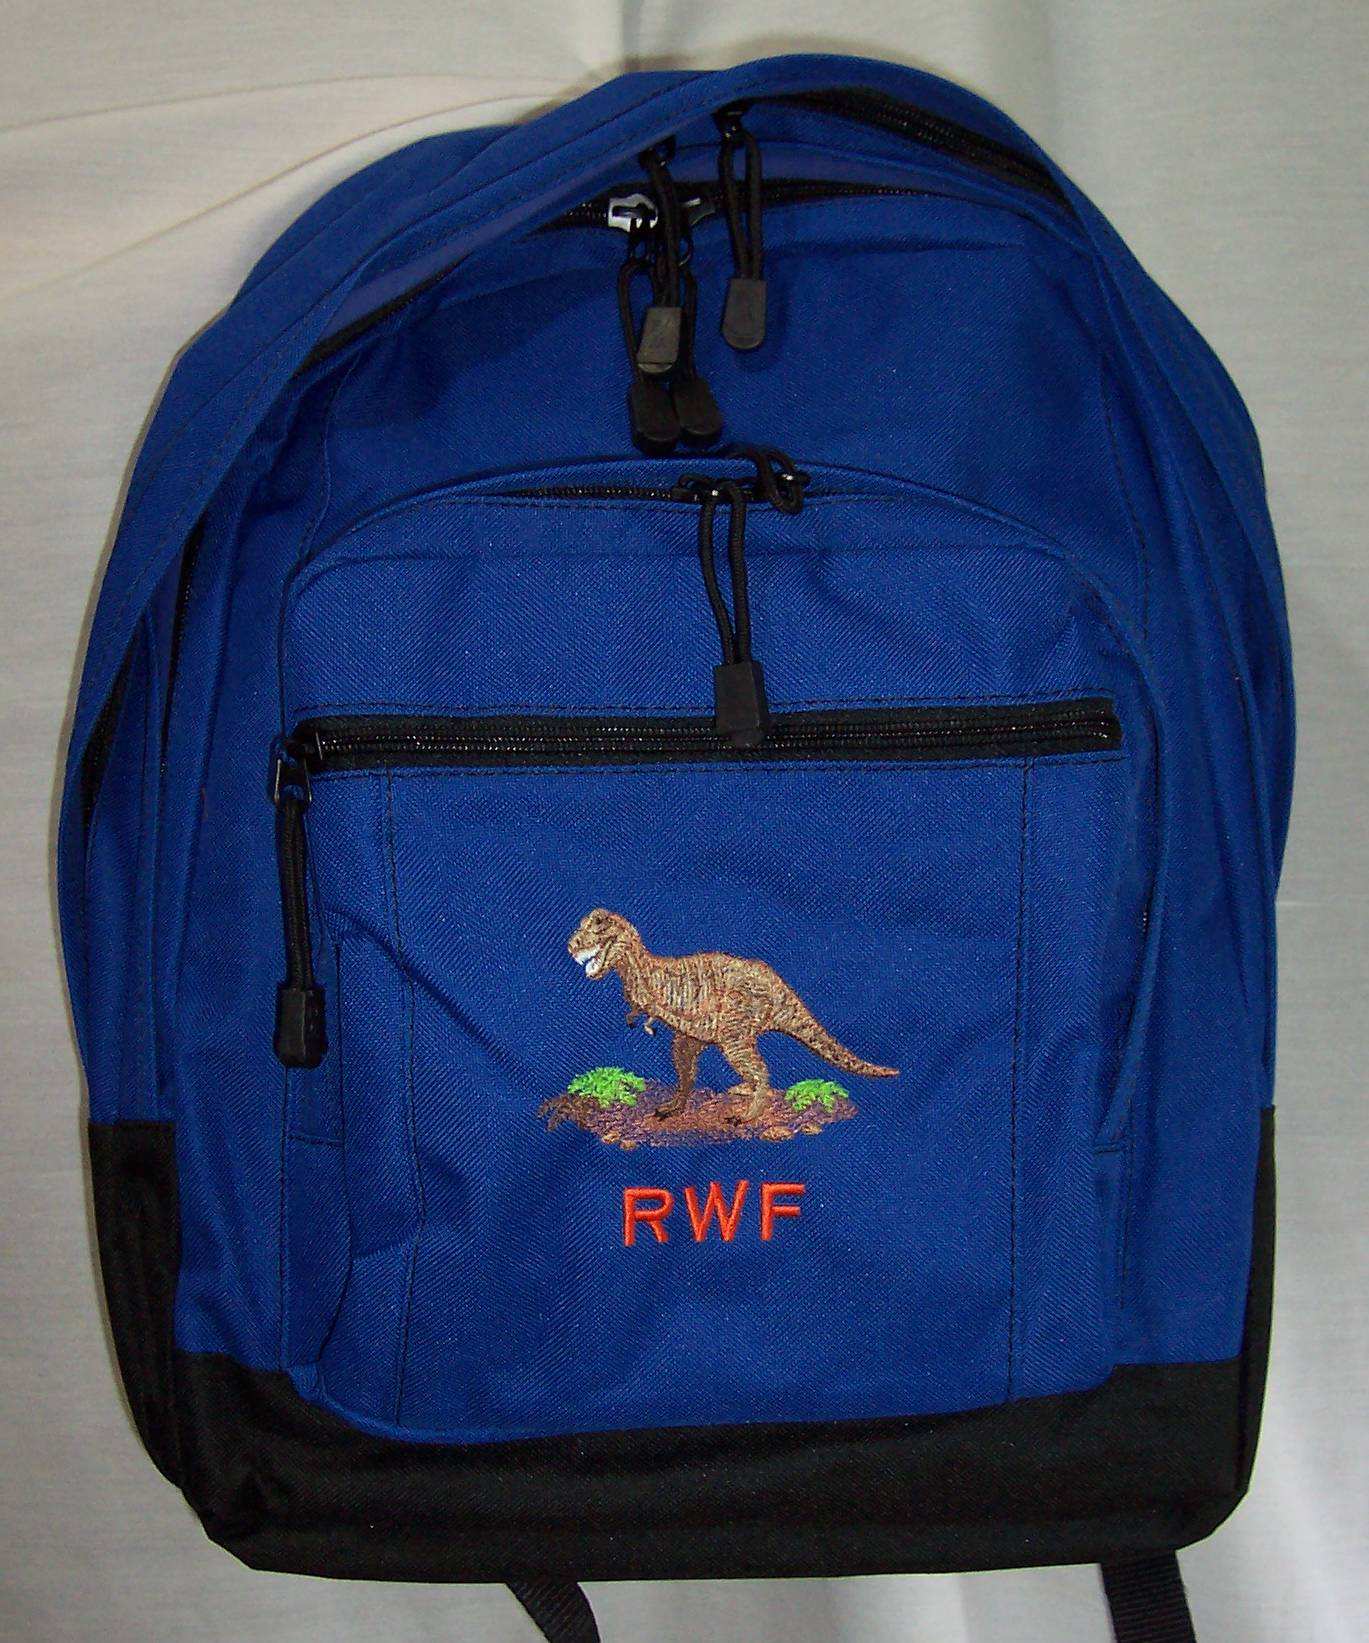 stegosaurus dinosaur backpack school book bag personalized